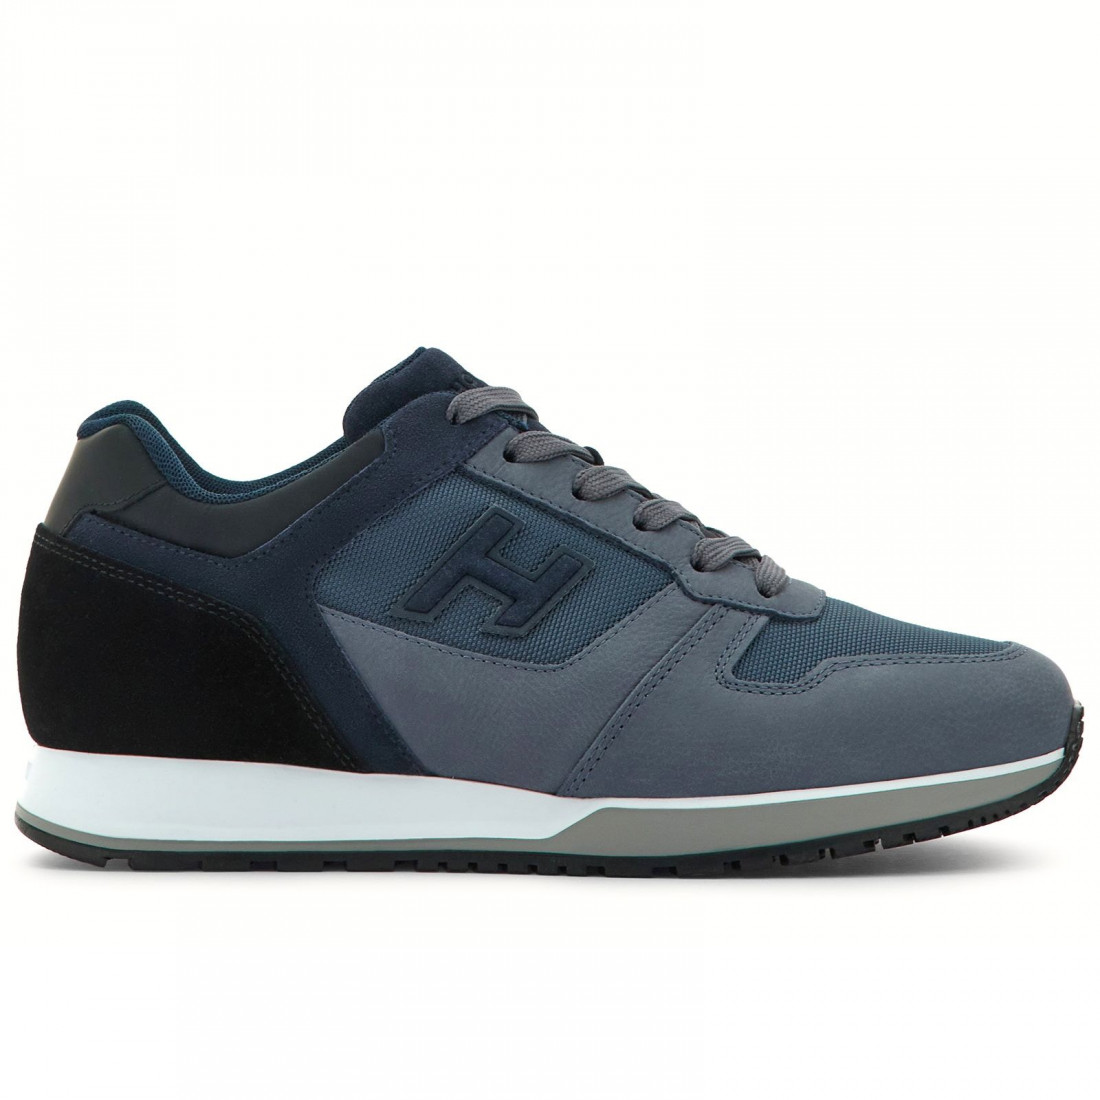 Sneaker Hogan H321 in blue nabuk and fabric